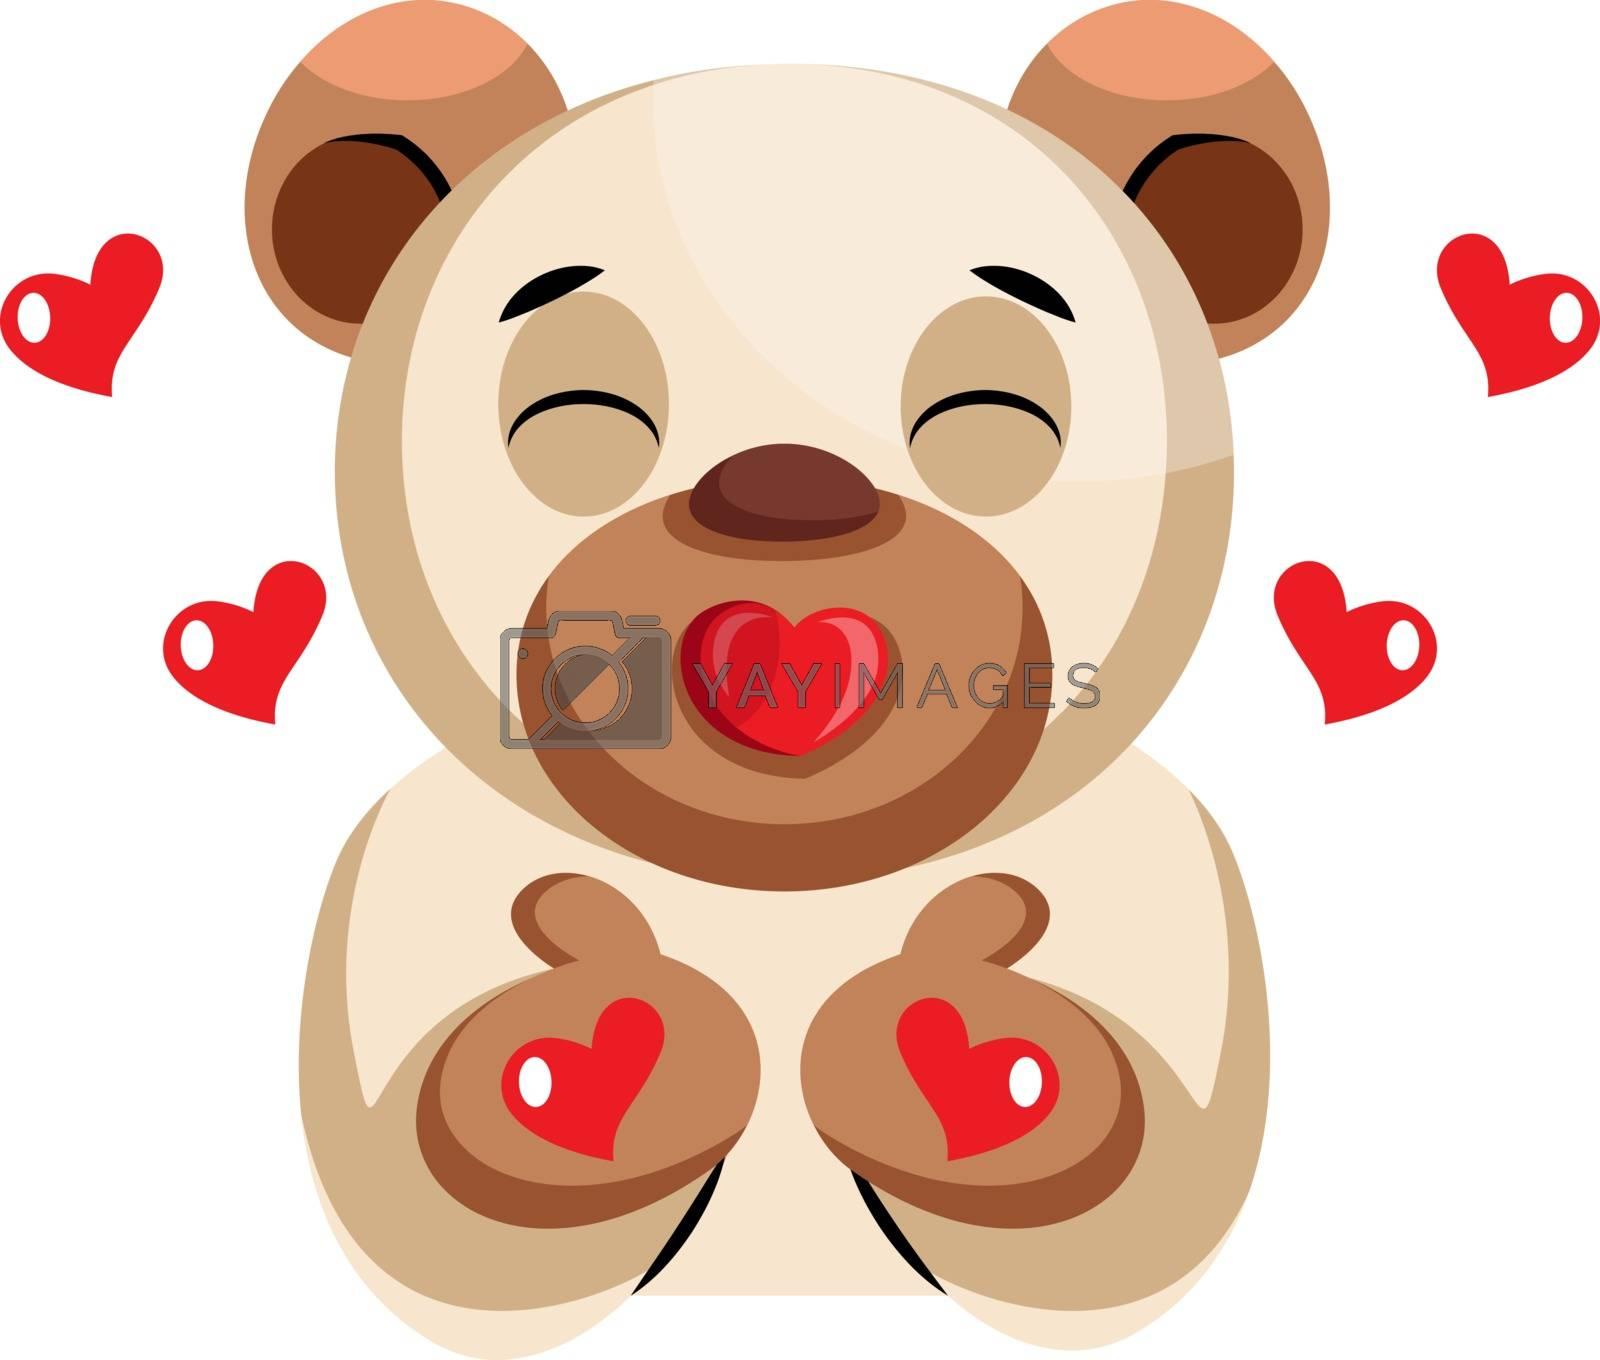 Royalty free image of Cute bear sending kisses illustration vector on white background by Morphart